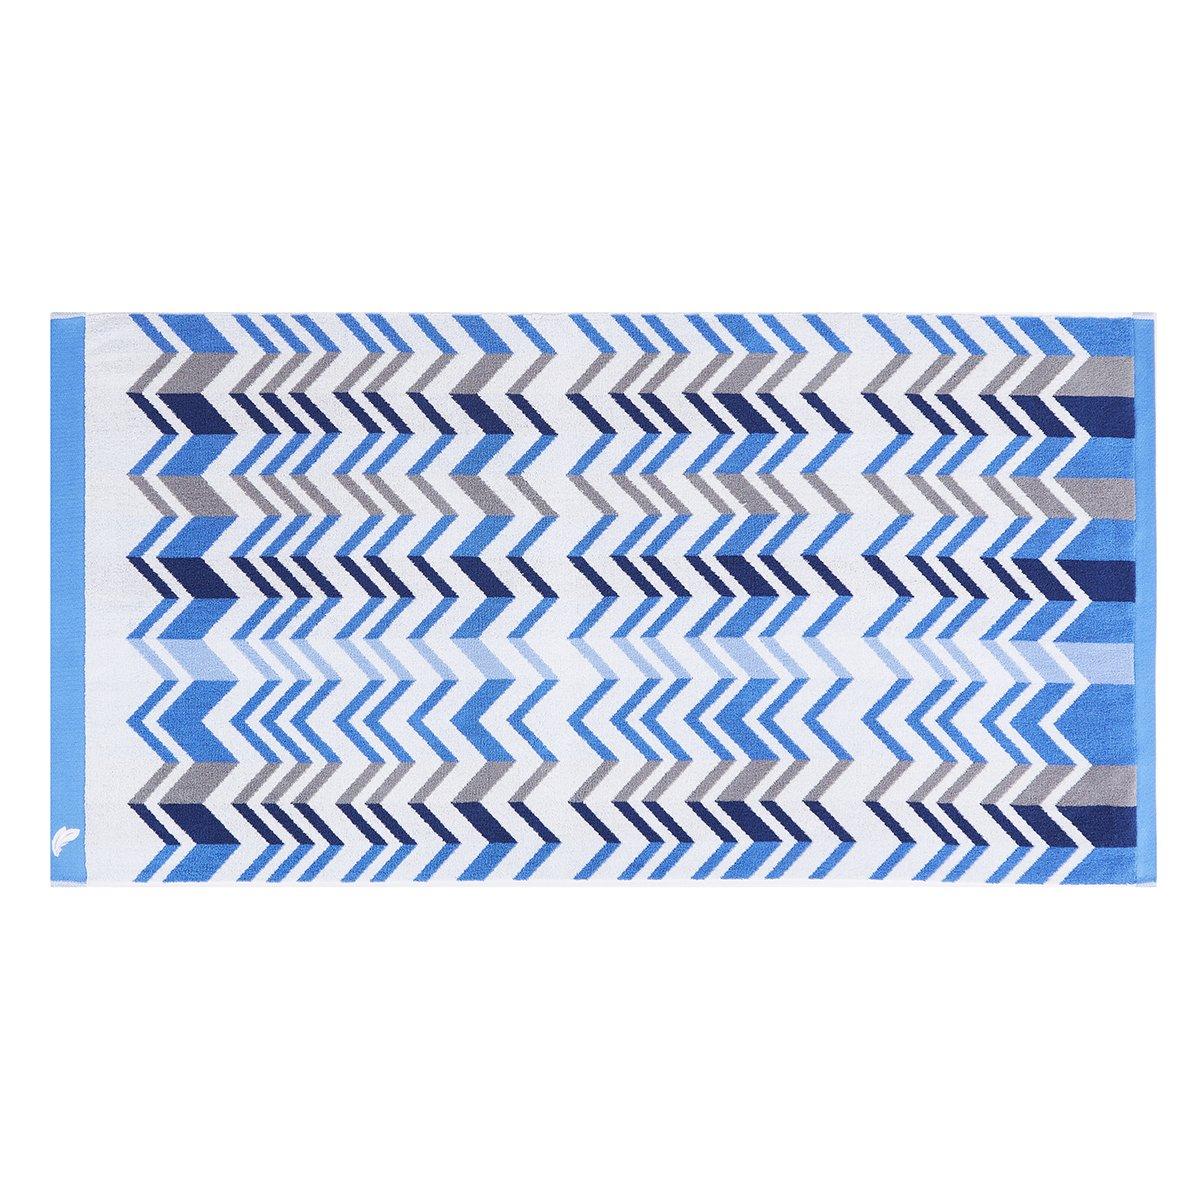 Drap de douche coton 70x140 cm bleu clair rayé